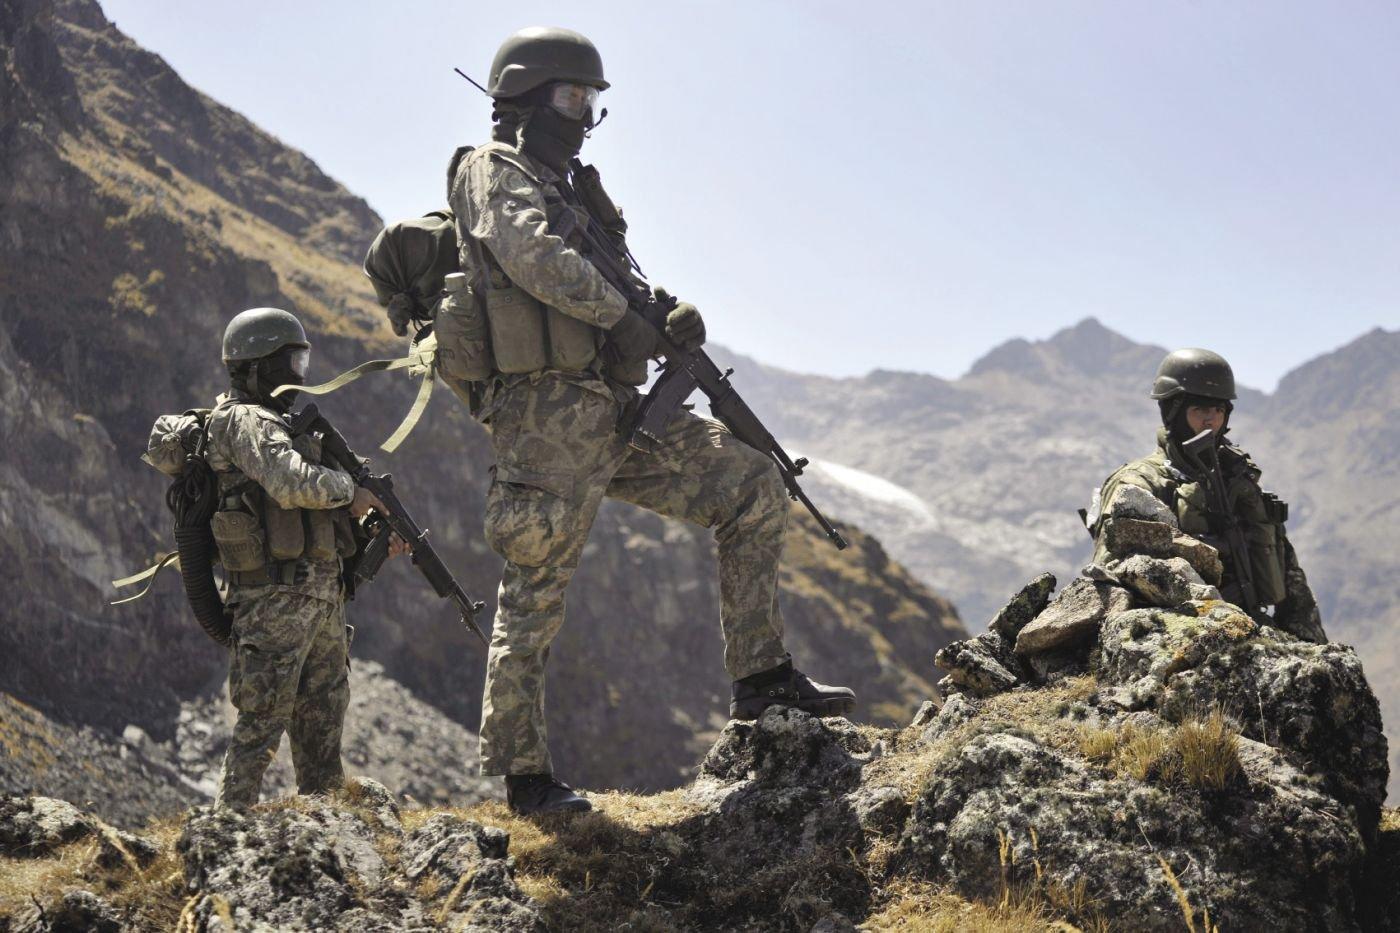 Forces Against Terrorism